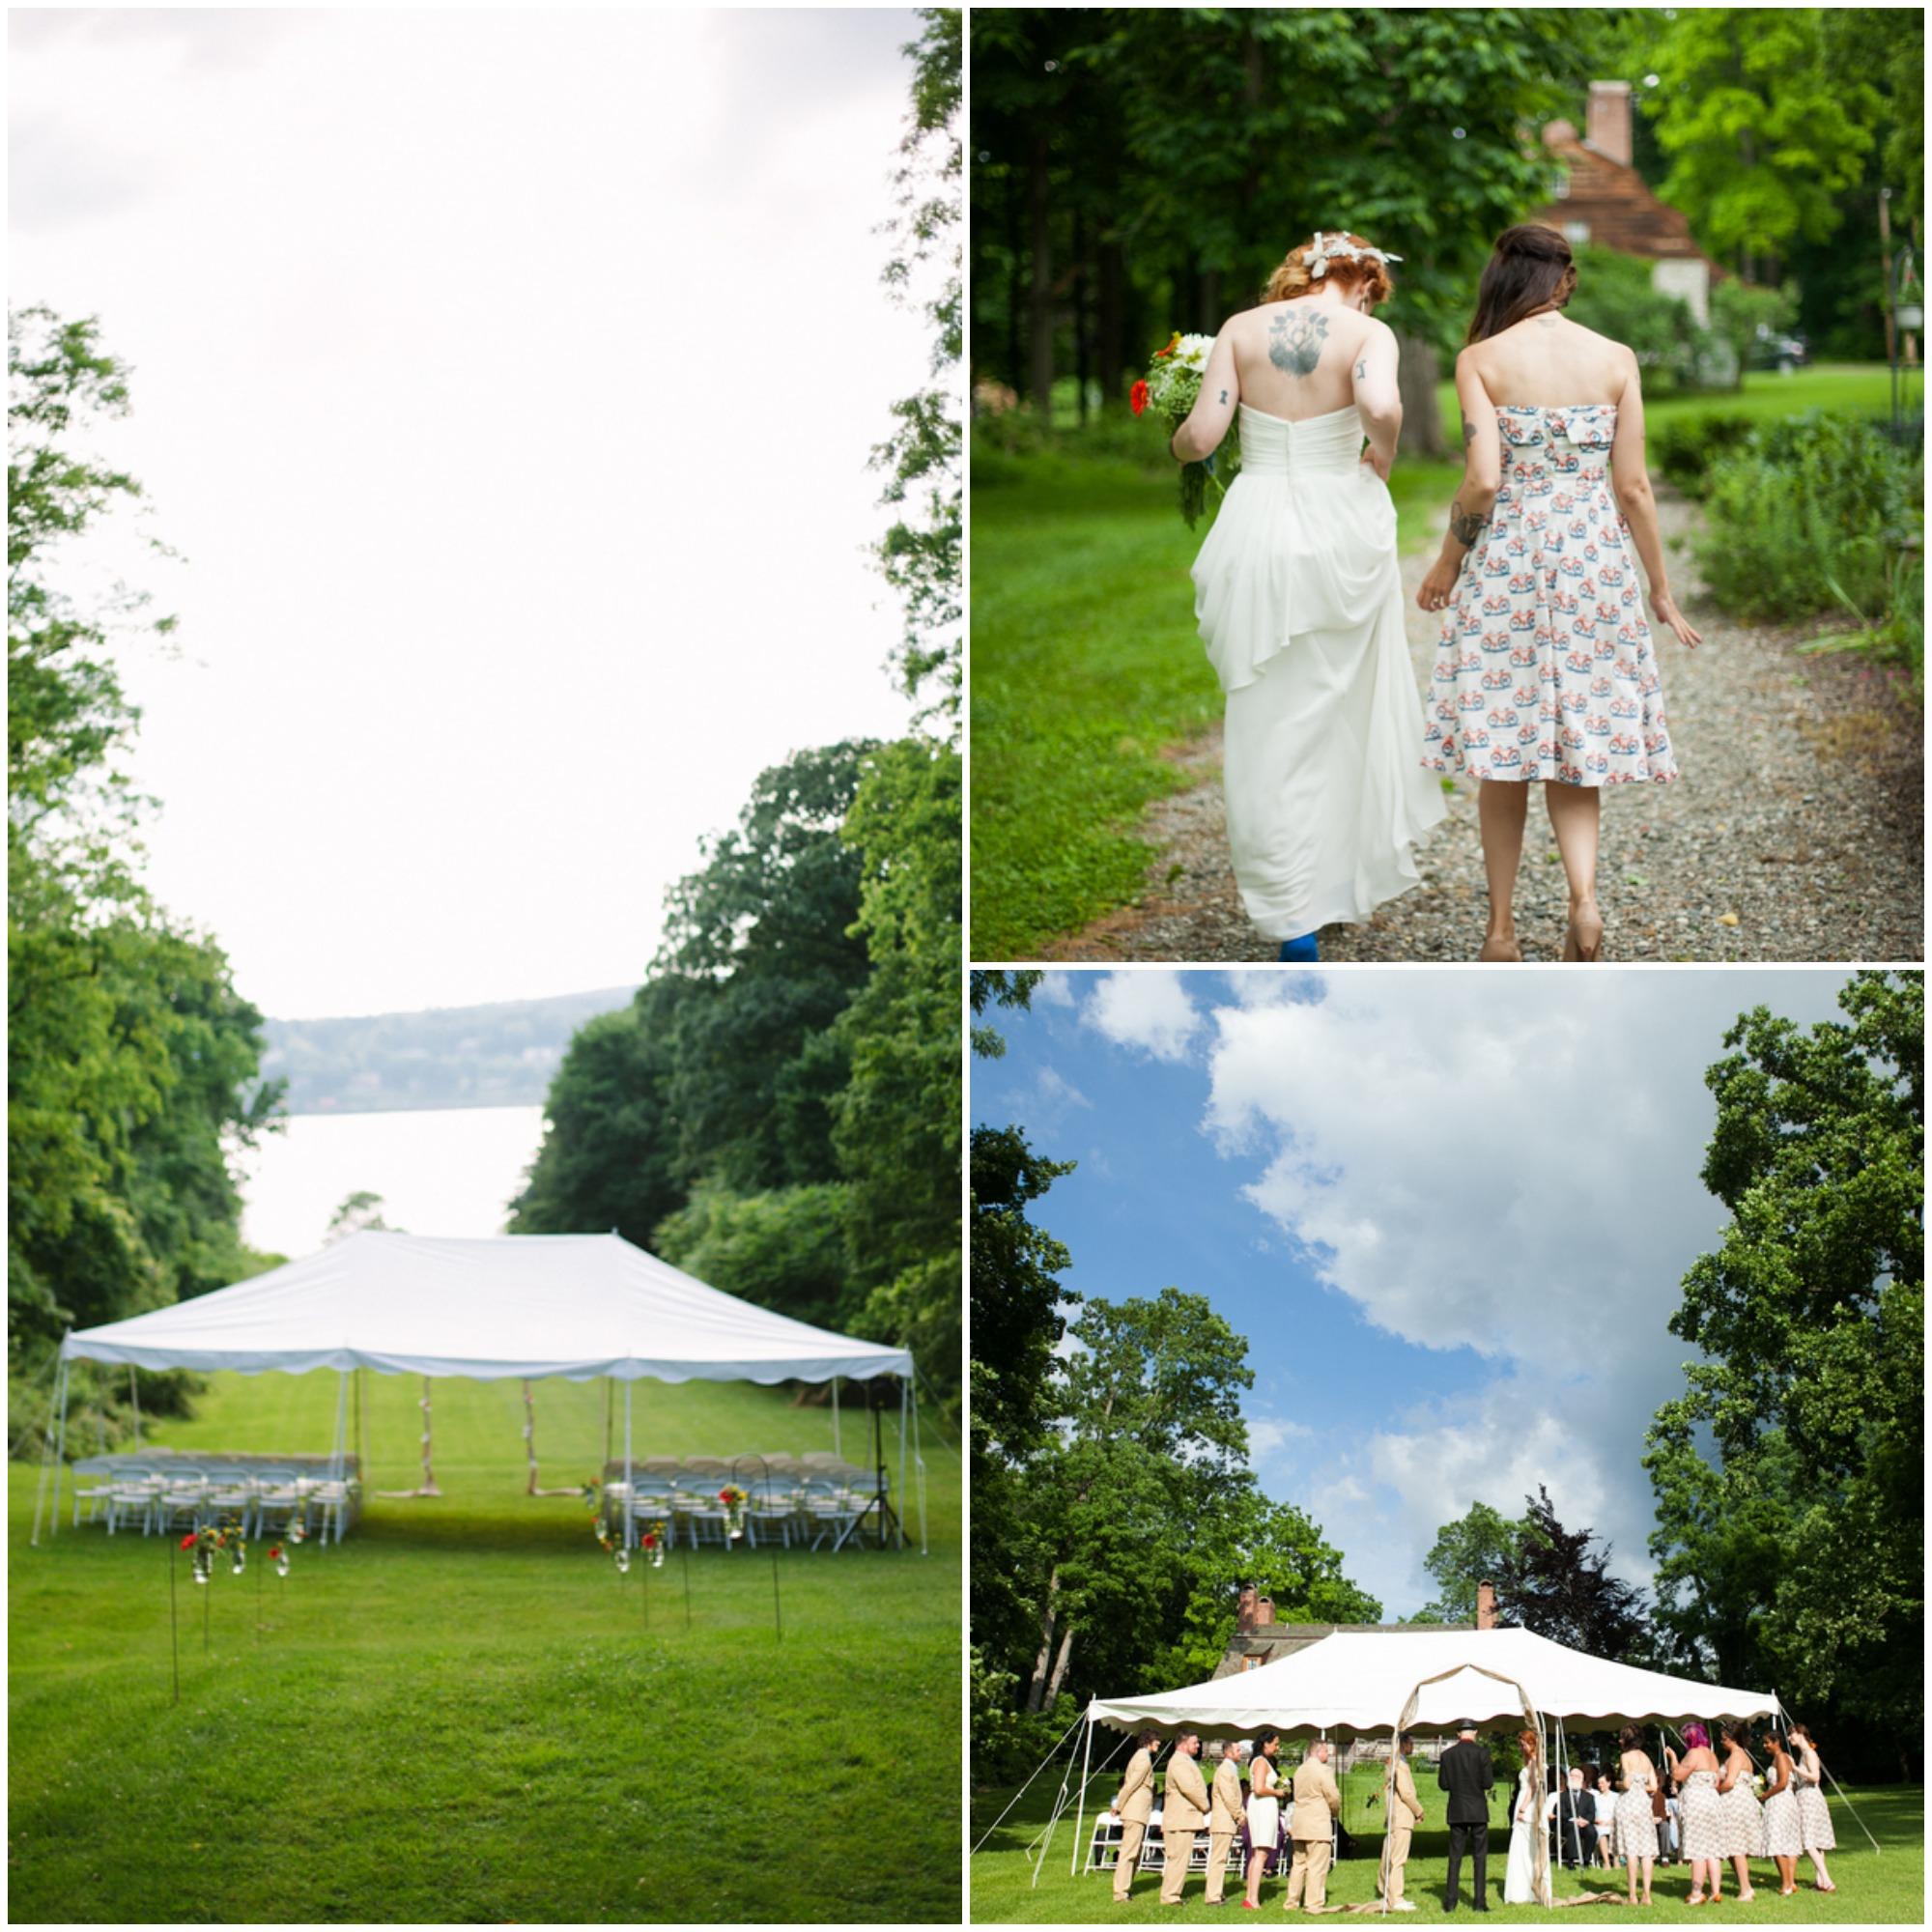 Outdoor Wedding Ceremony Rockford Il: Hudson River Valley Barn Wedding